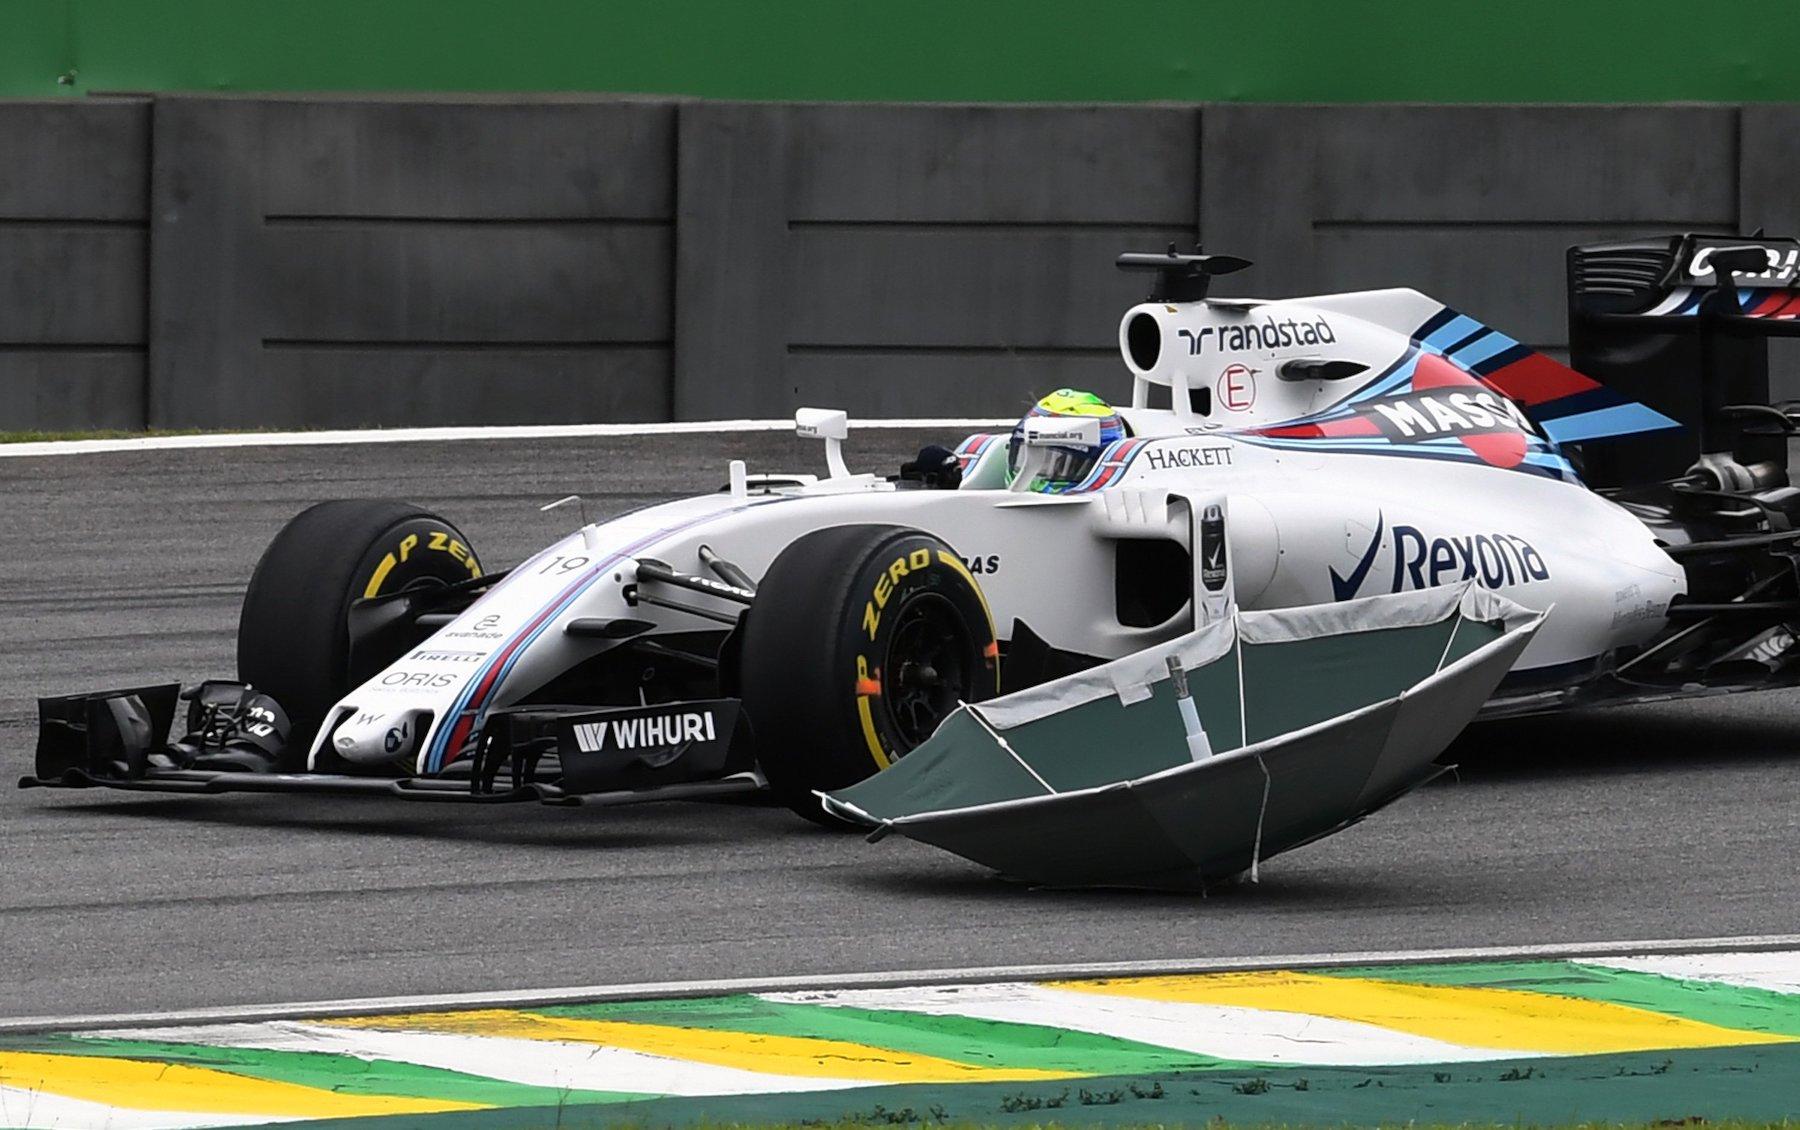 Salracing - Felipe Massa | Williams Martini Racing